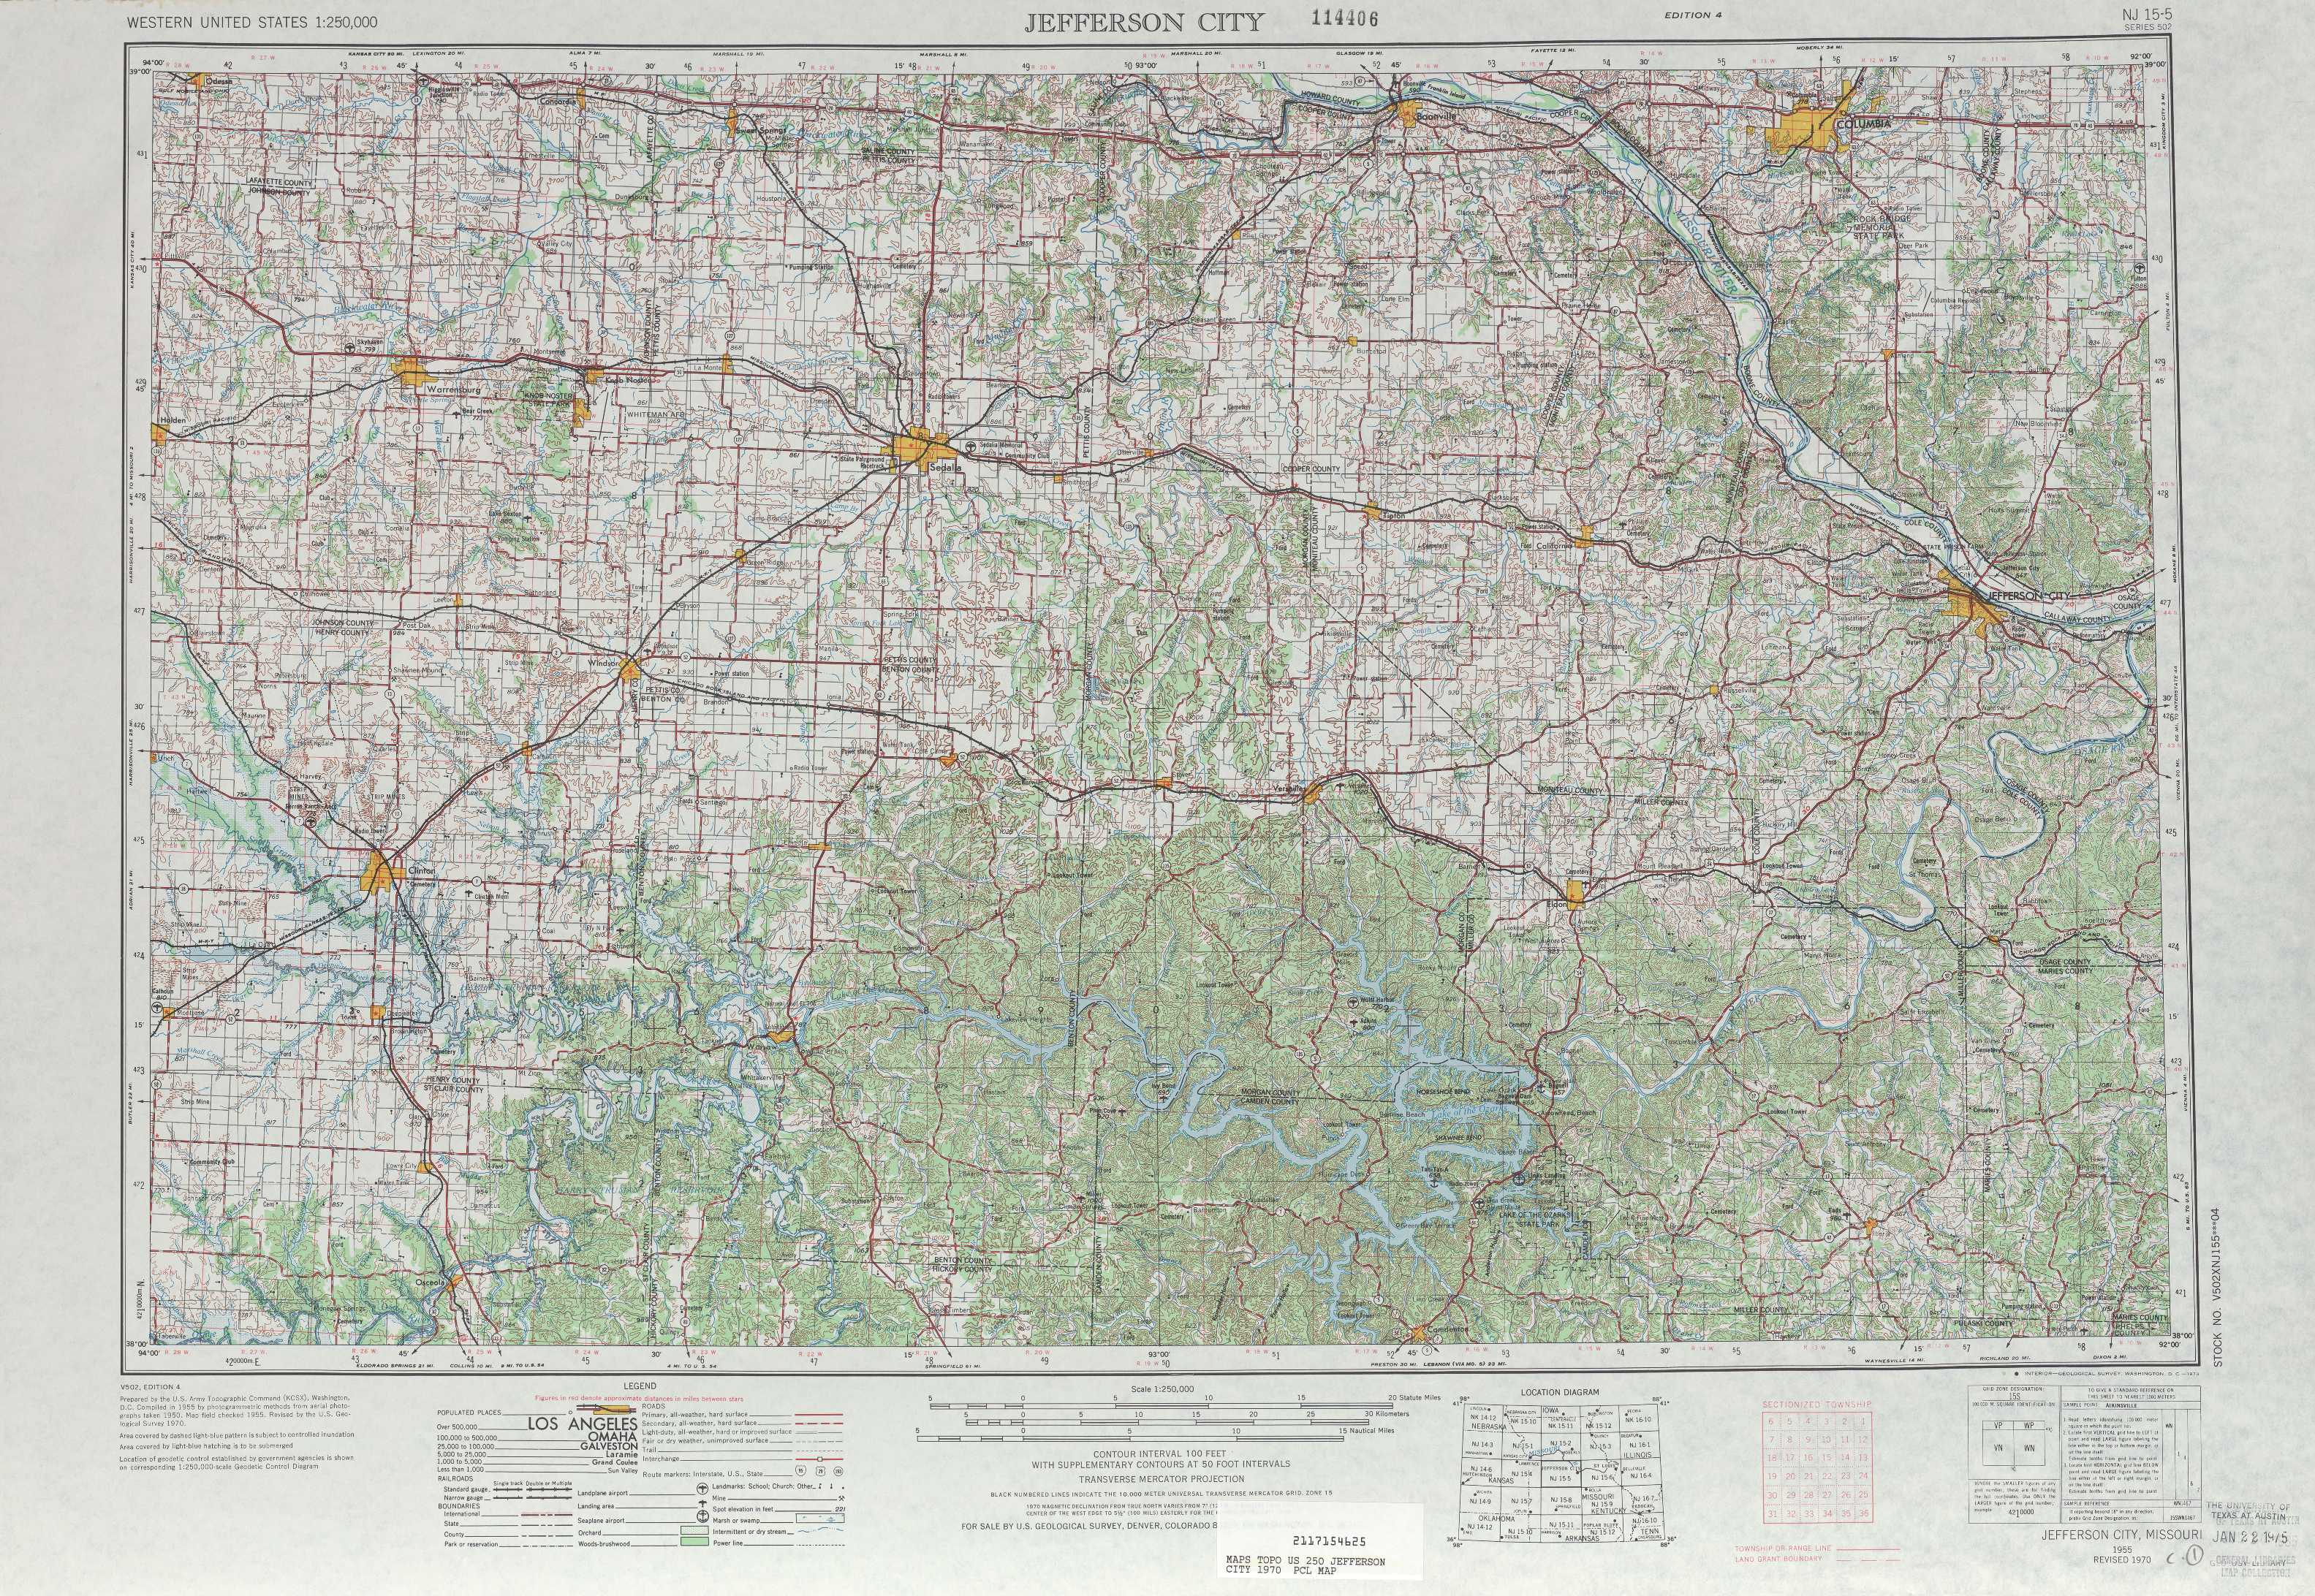 Jefferson City topographic maps MO USGS Topo Quad 38092a1 at 1